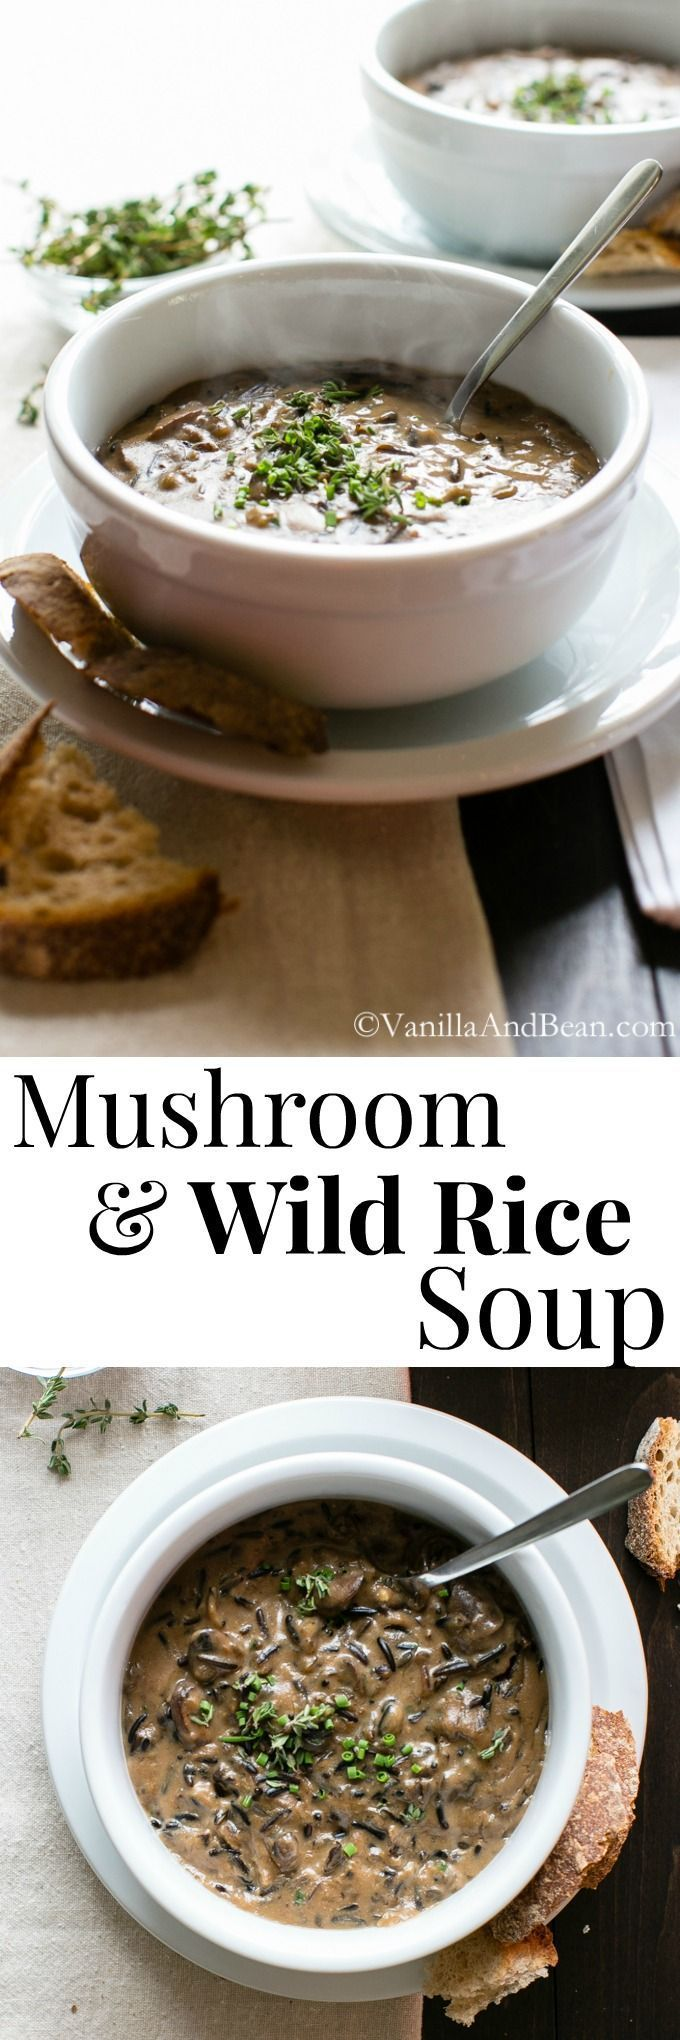 Creamy Mushroom and Wild Rice Soup | Vegan | Vanilla And Bean